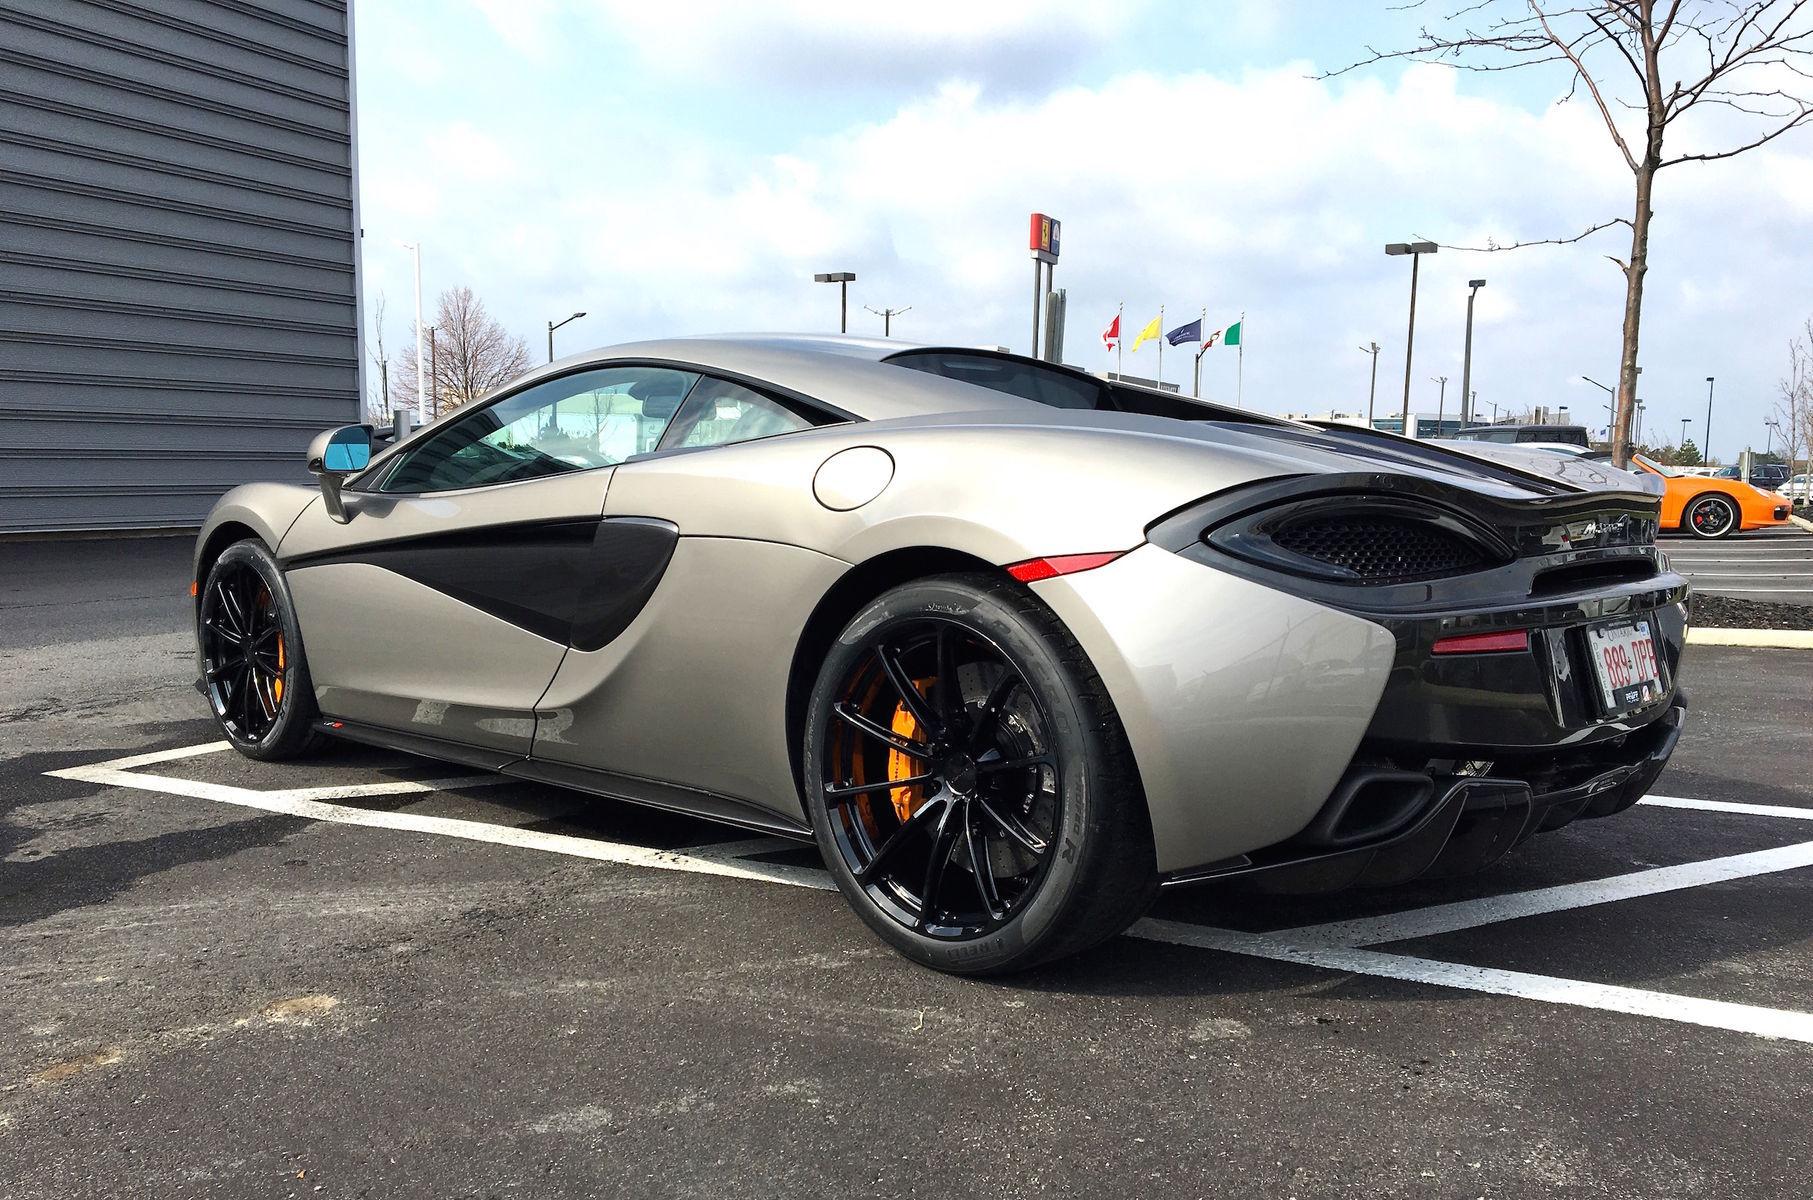 2016 McLaren    McLaren 570S on Pirelli Trofeo R Tires and Forgeline One Piece Forged Monoblock GT1 5-Lug Wheels!